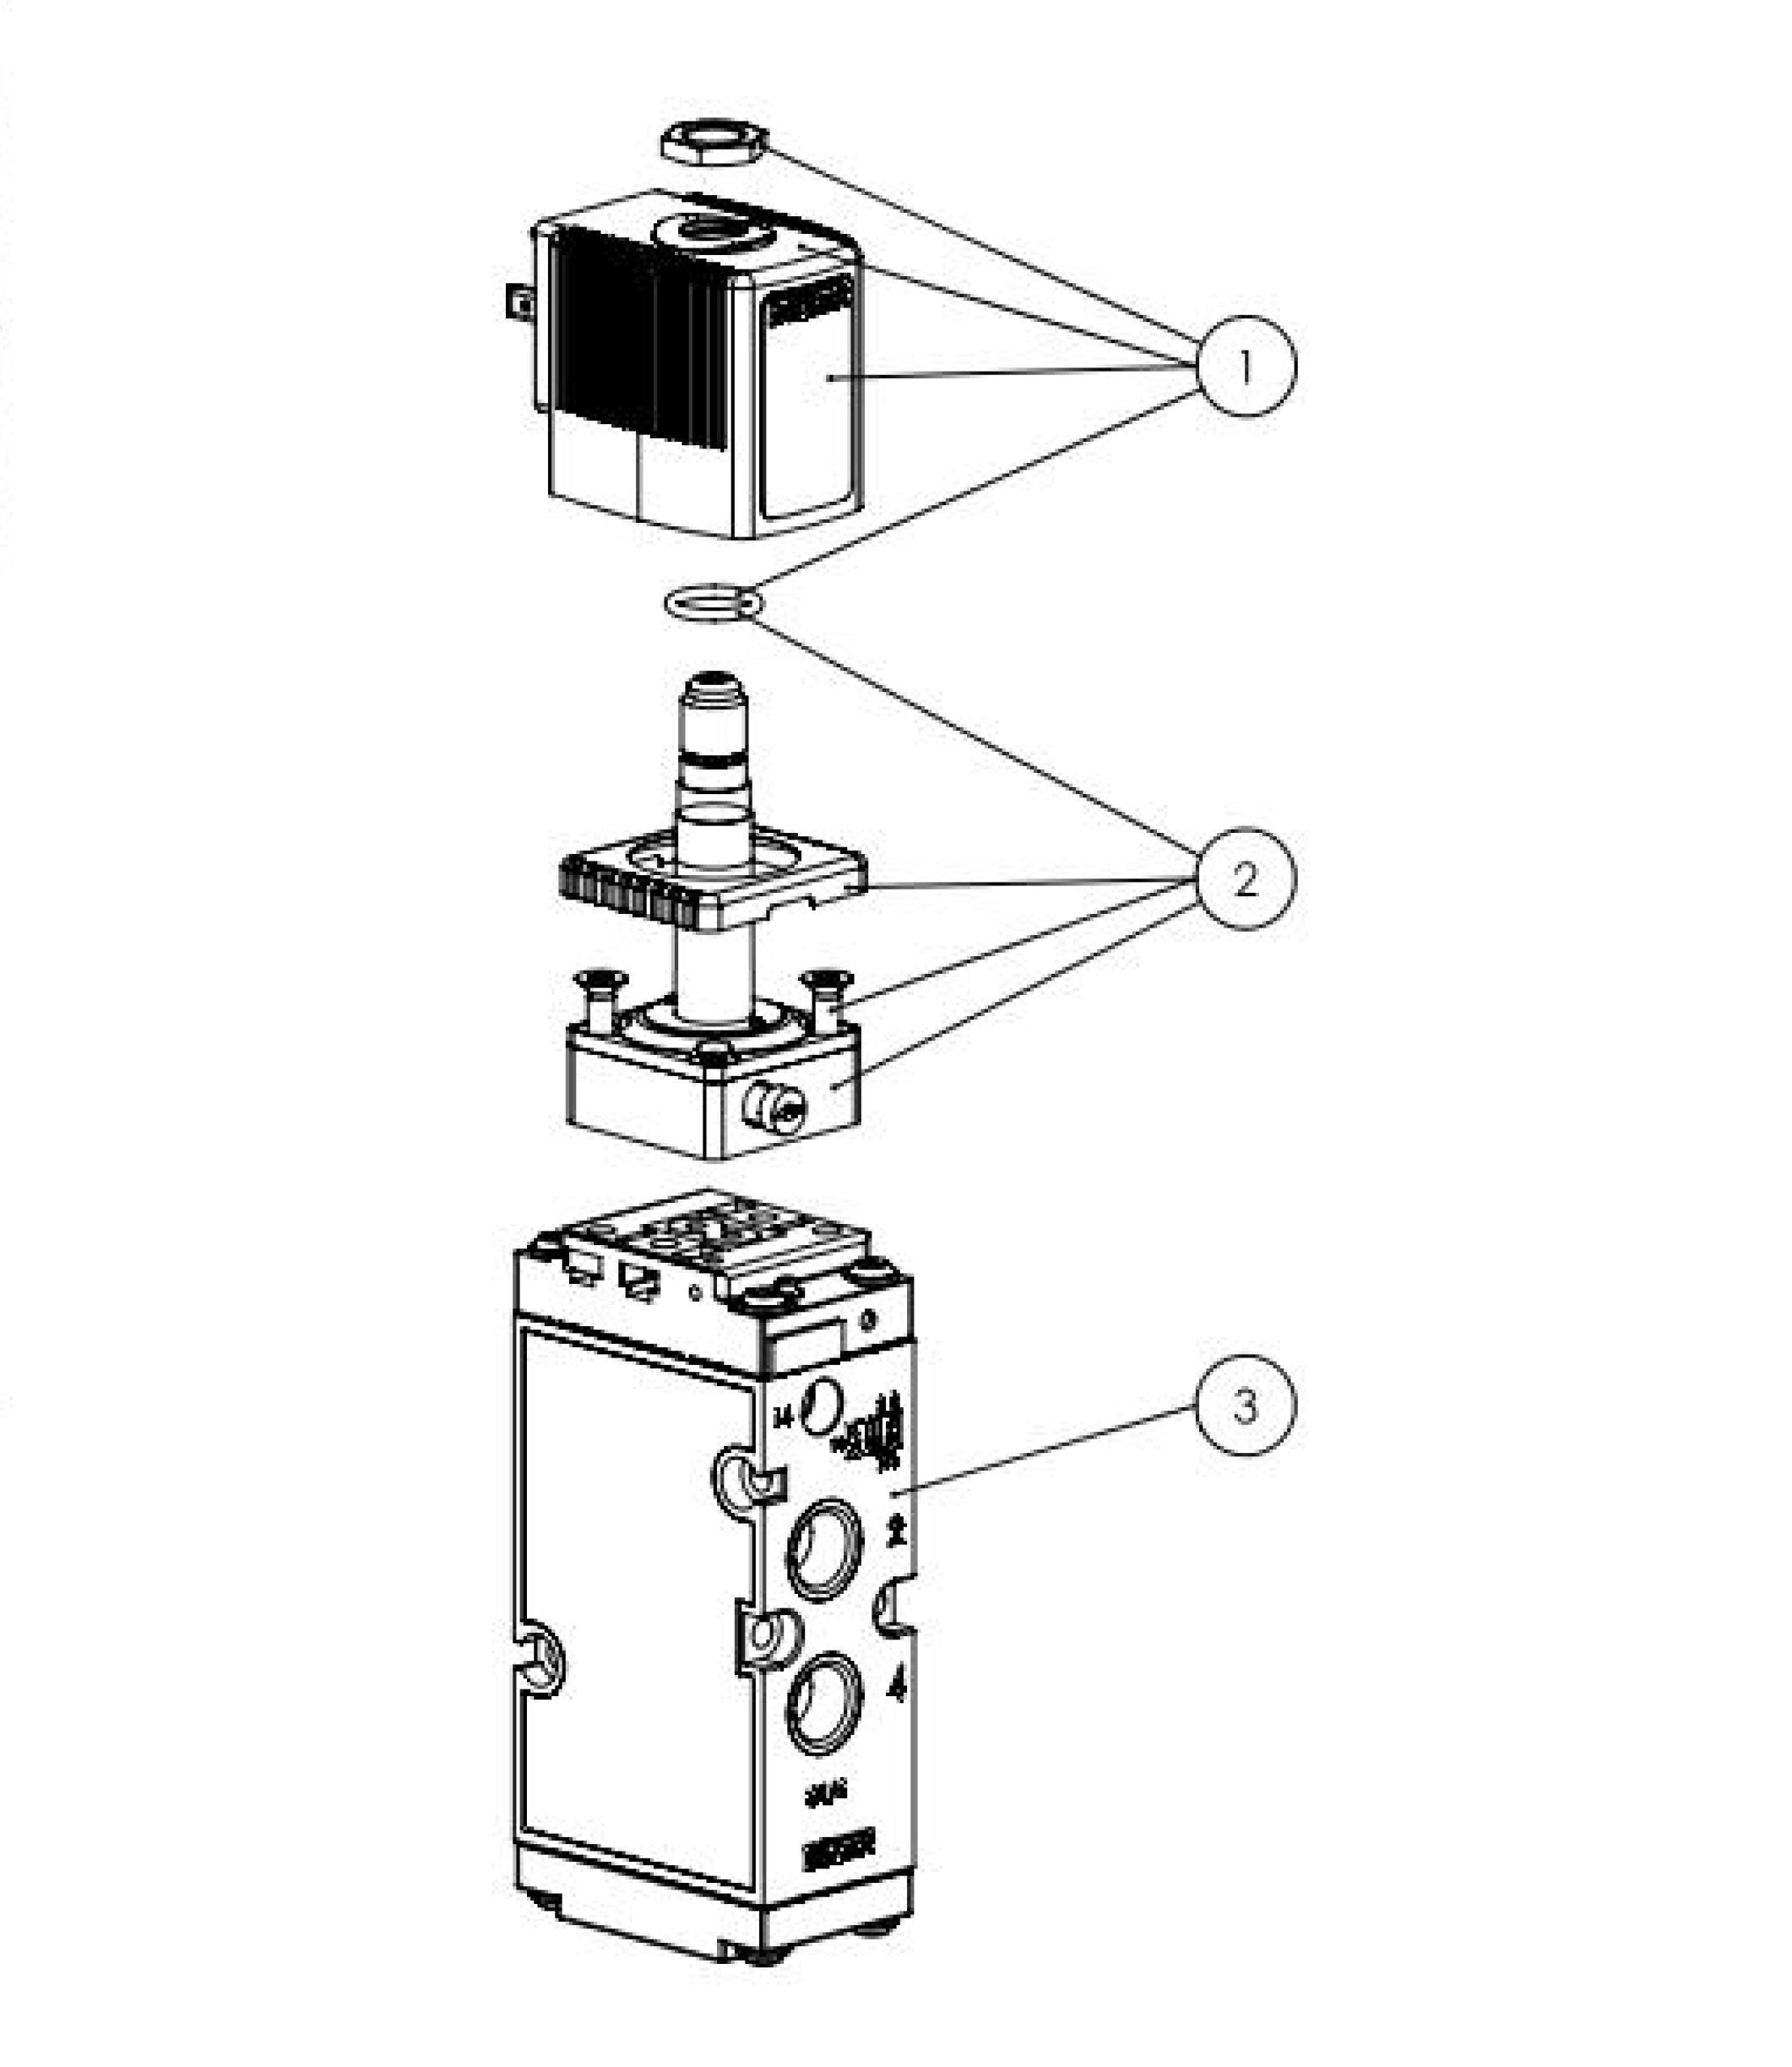 schema electrique electrovanne